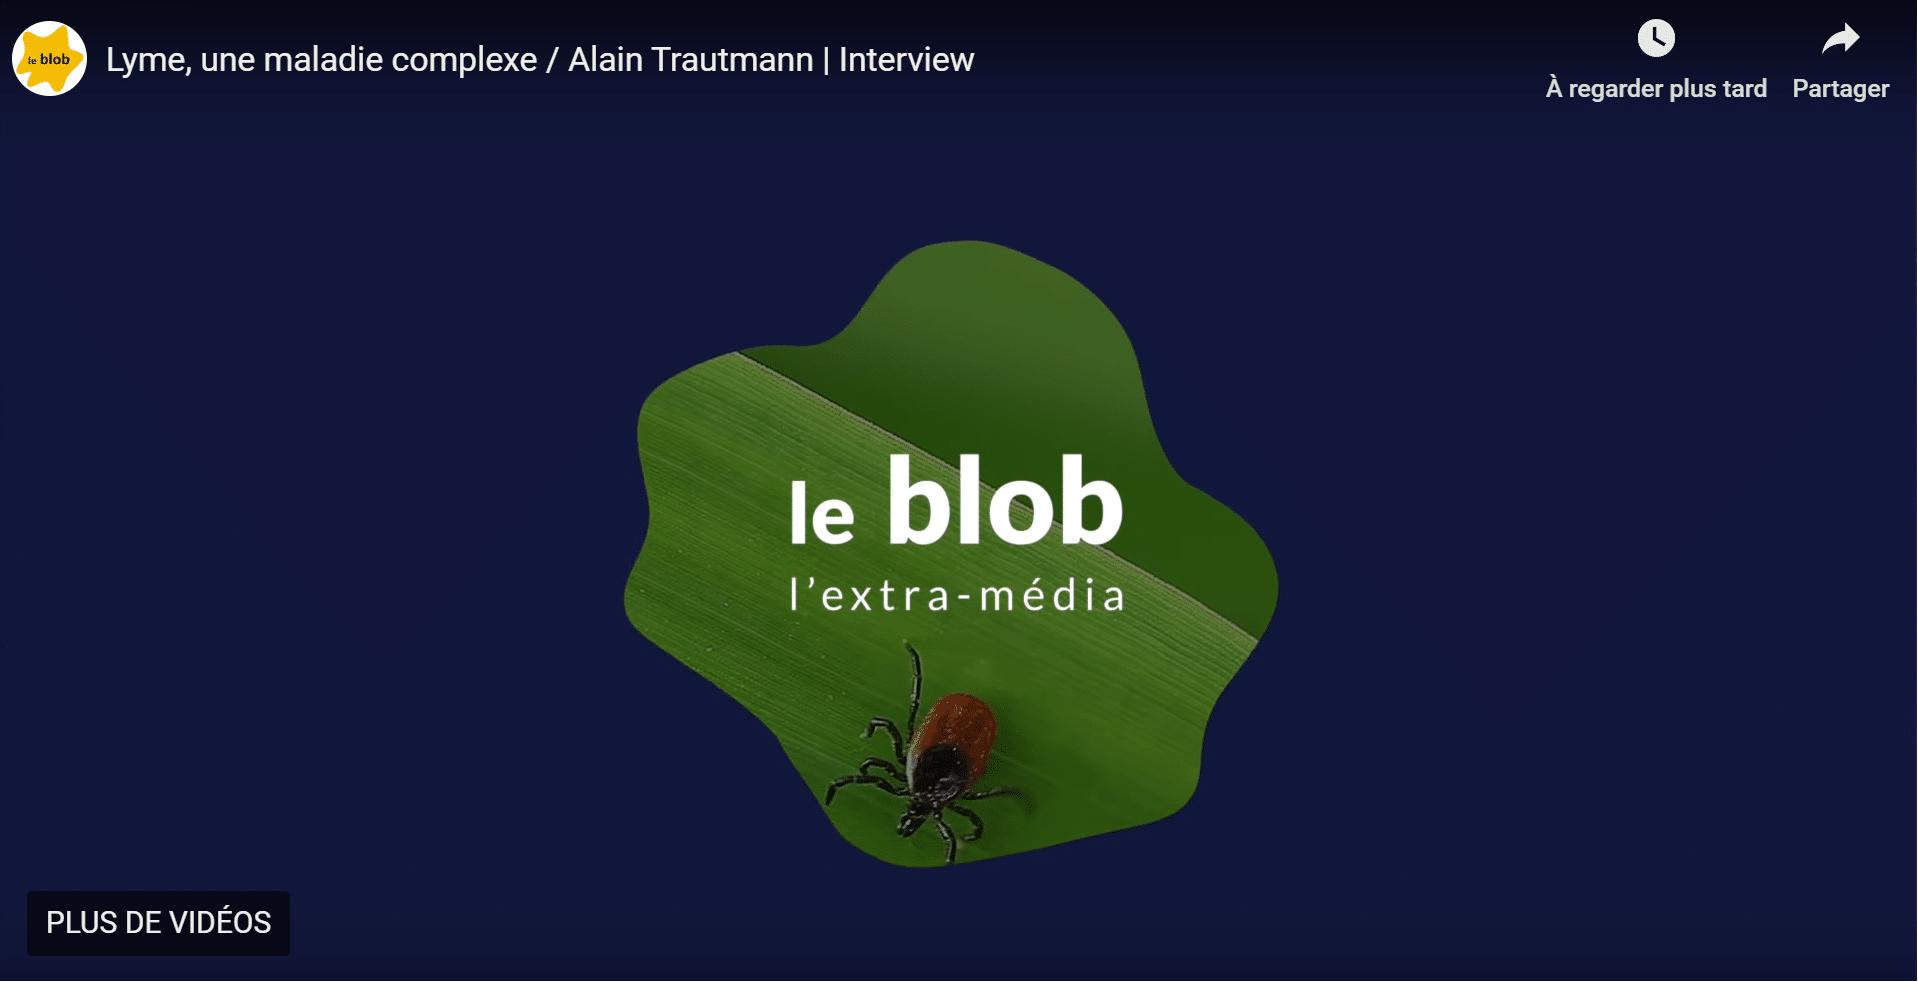 Alain Trautmann la maladie de Lyme